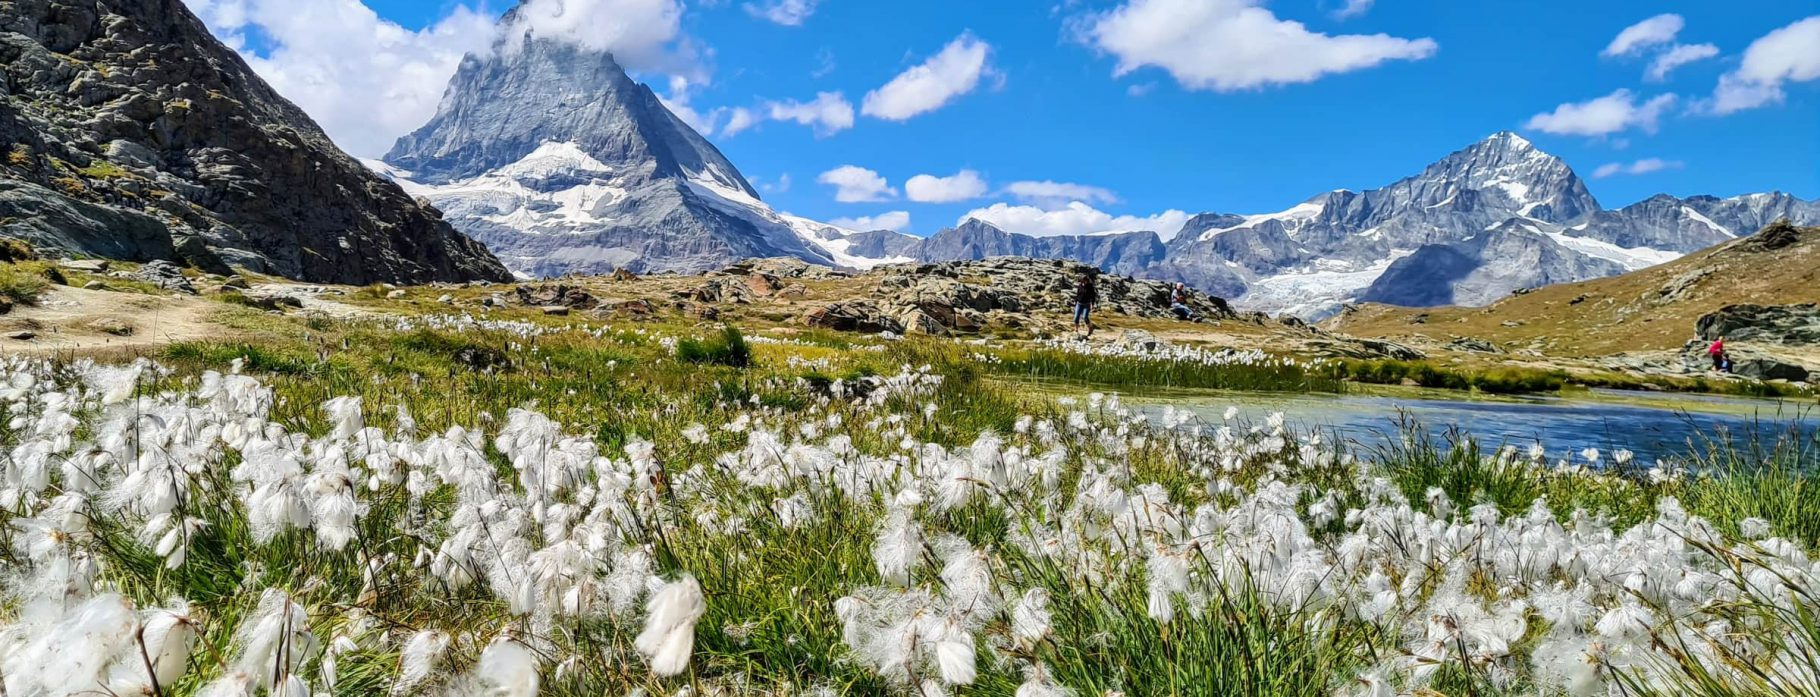 11 DAYS SWITZERLAND GRAND TOUR BY RAIL